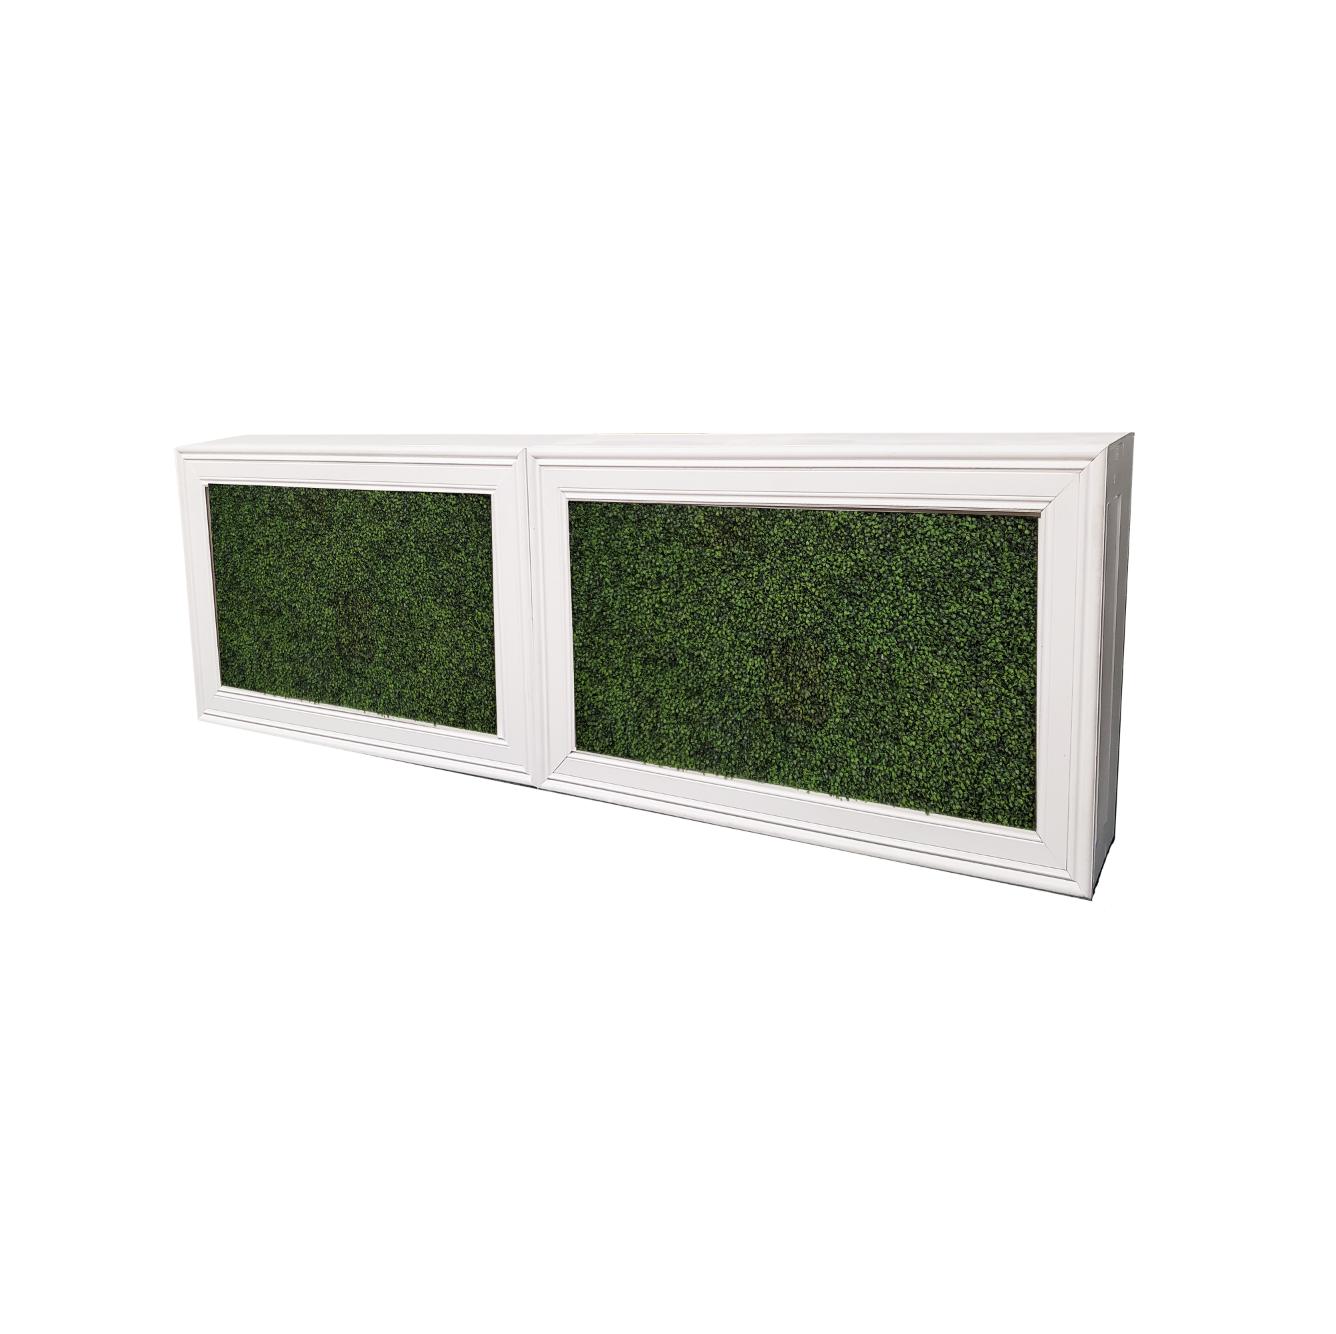 Double White Frame/Hedge Insert $500